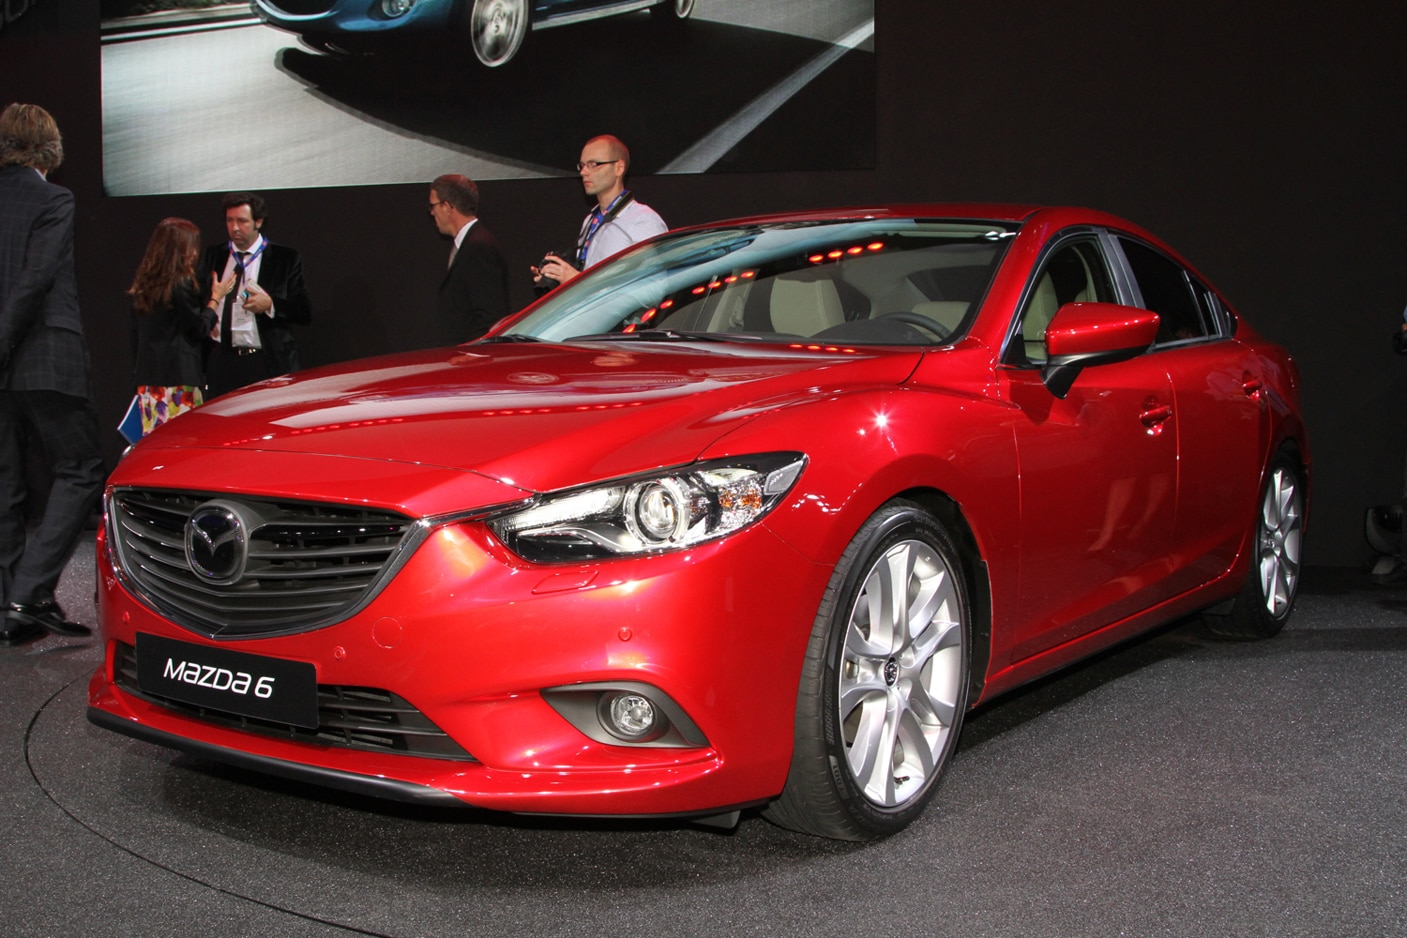 2014 Mazda 6 Front Three Quarter11